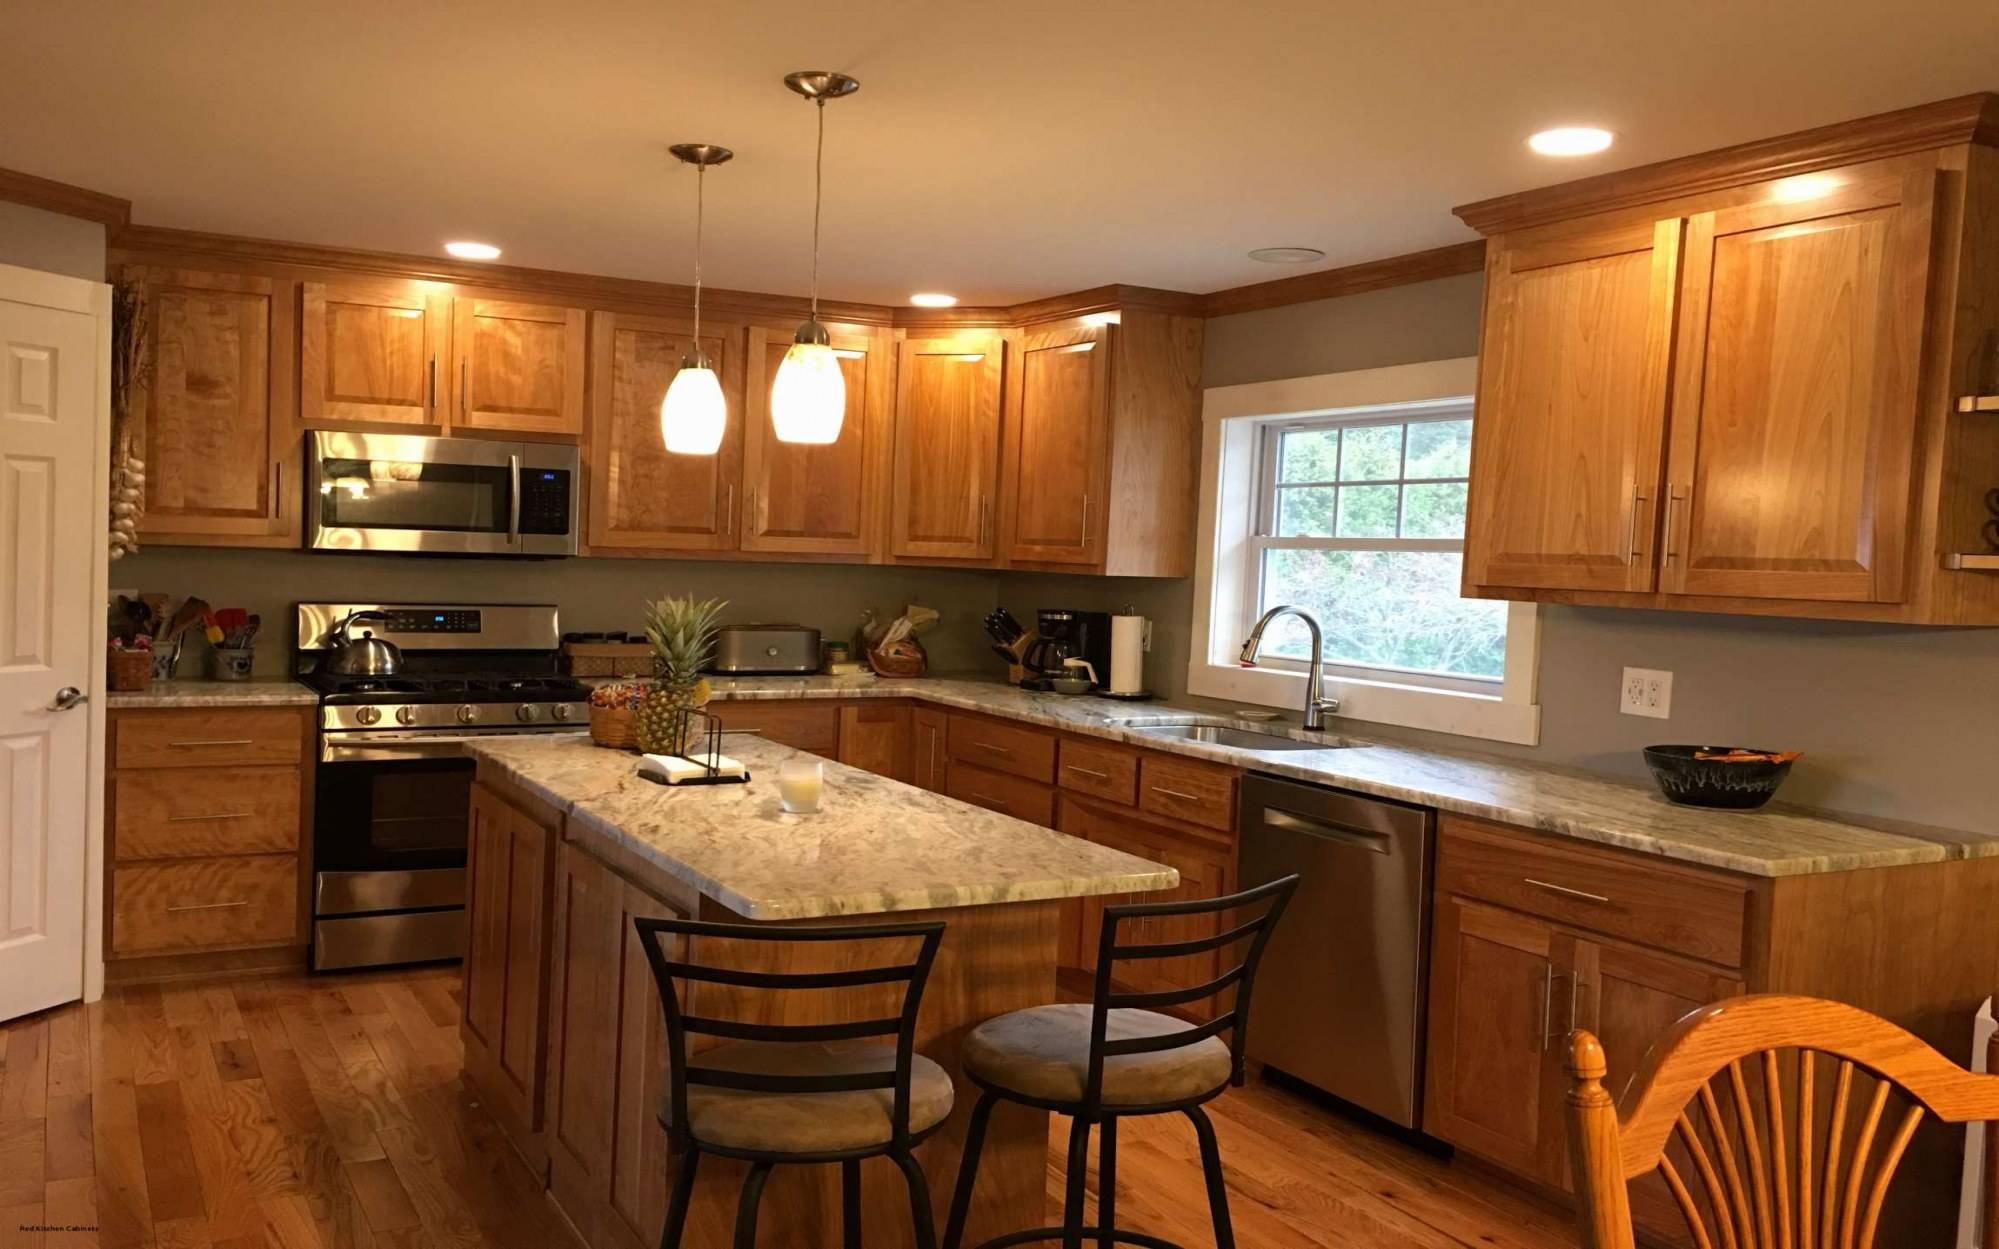 modern kitchen cabinets 38 new modern farmhouse kitchen colors subway tiles of modern kitchen cabinets